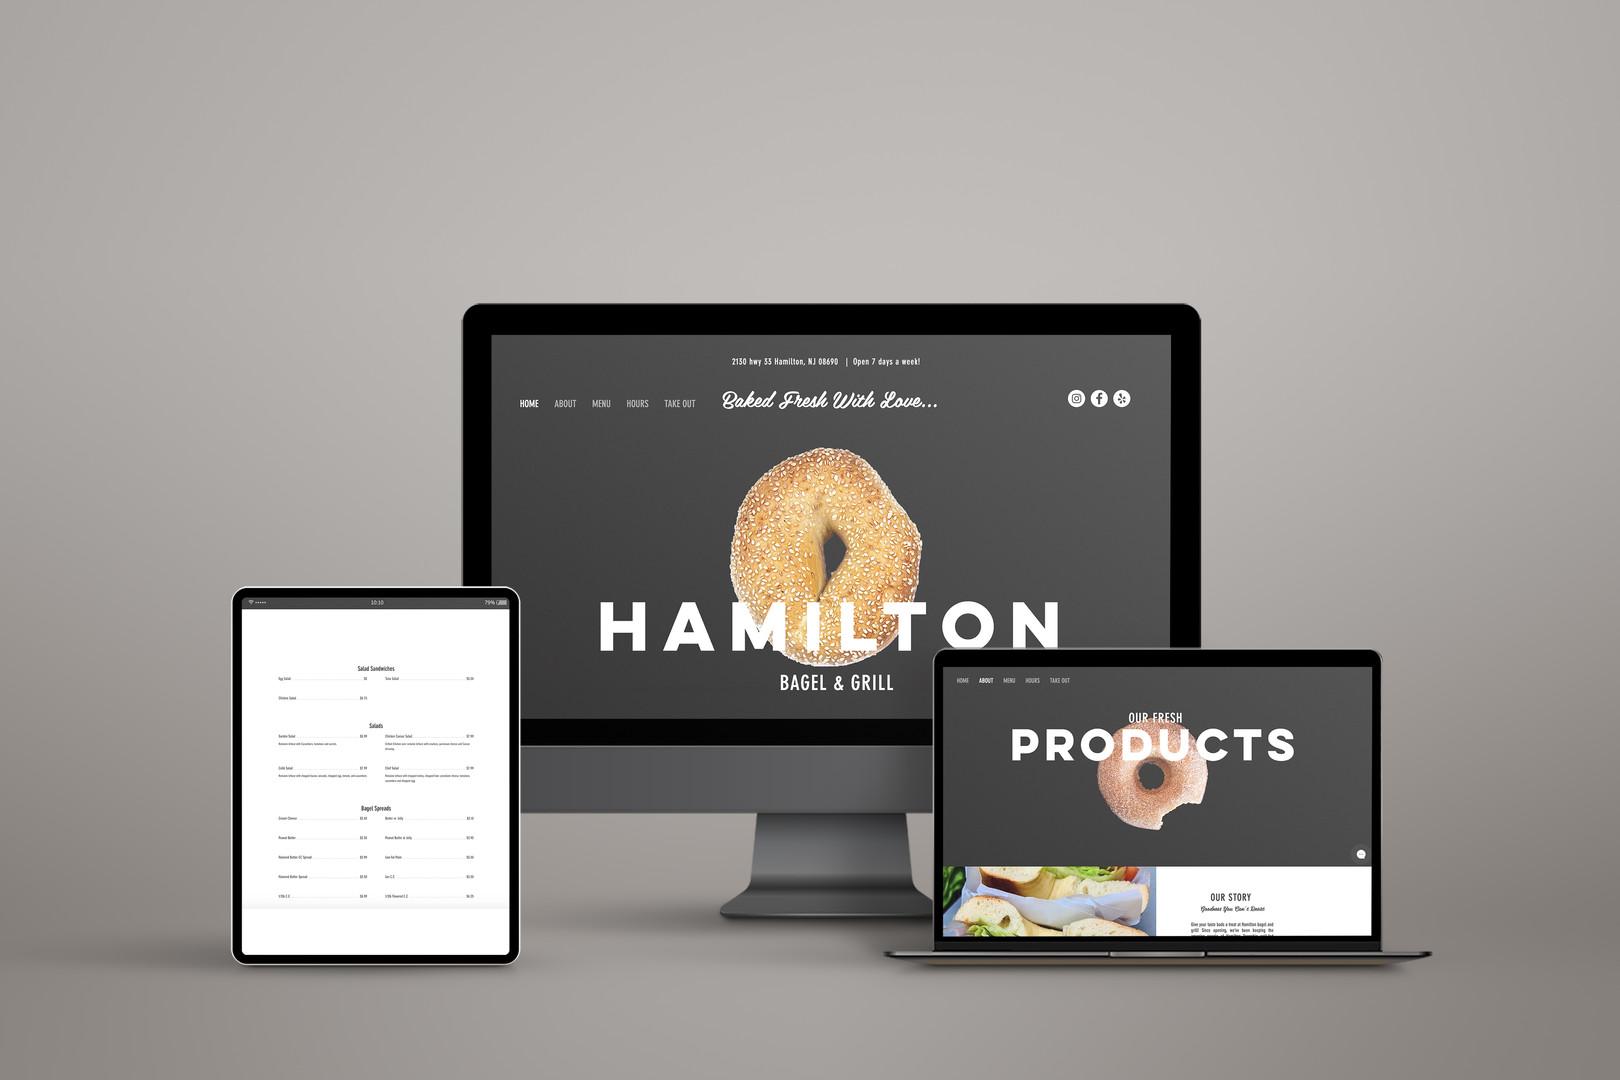 Hamilton Bagel & Grill